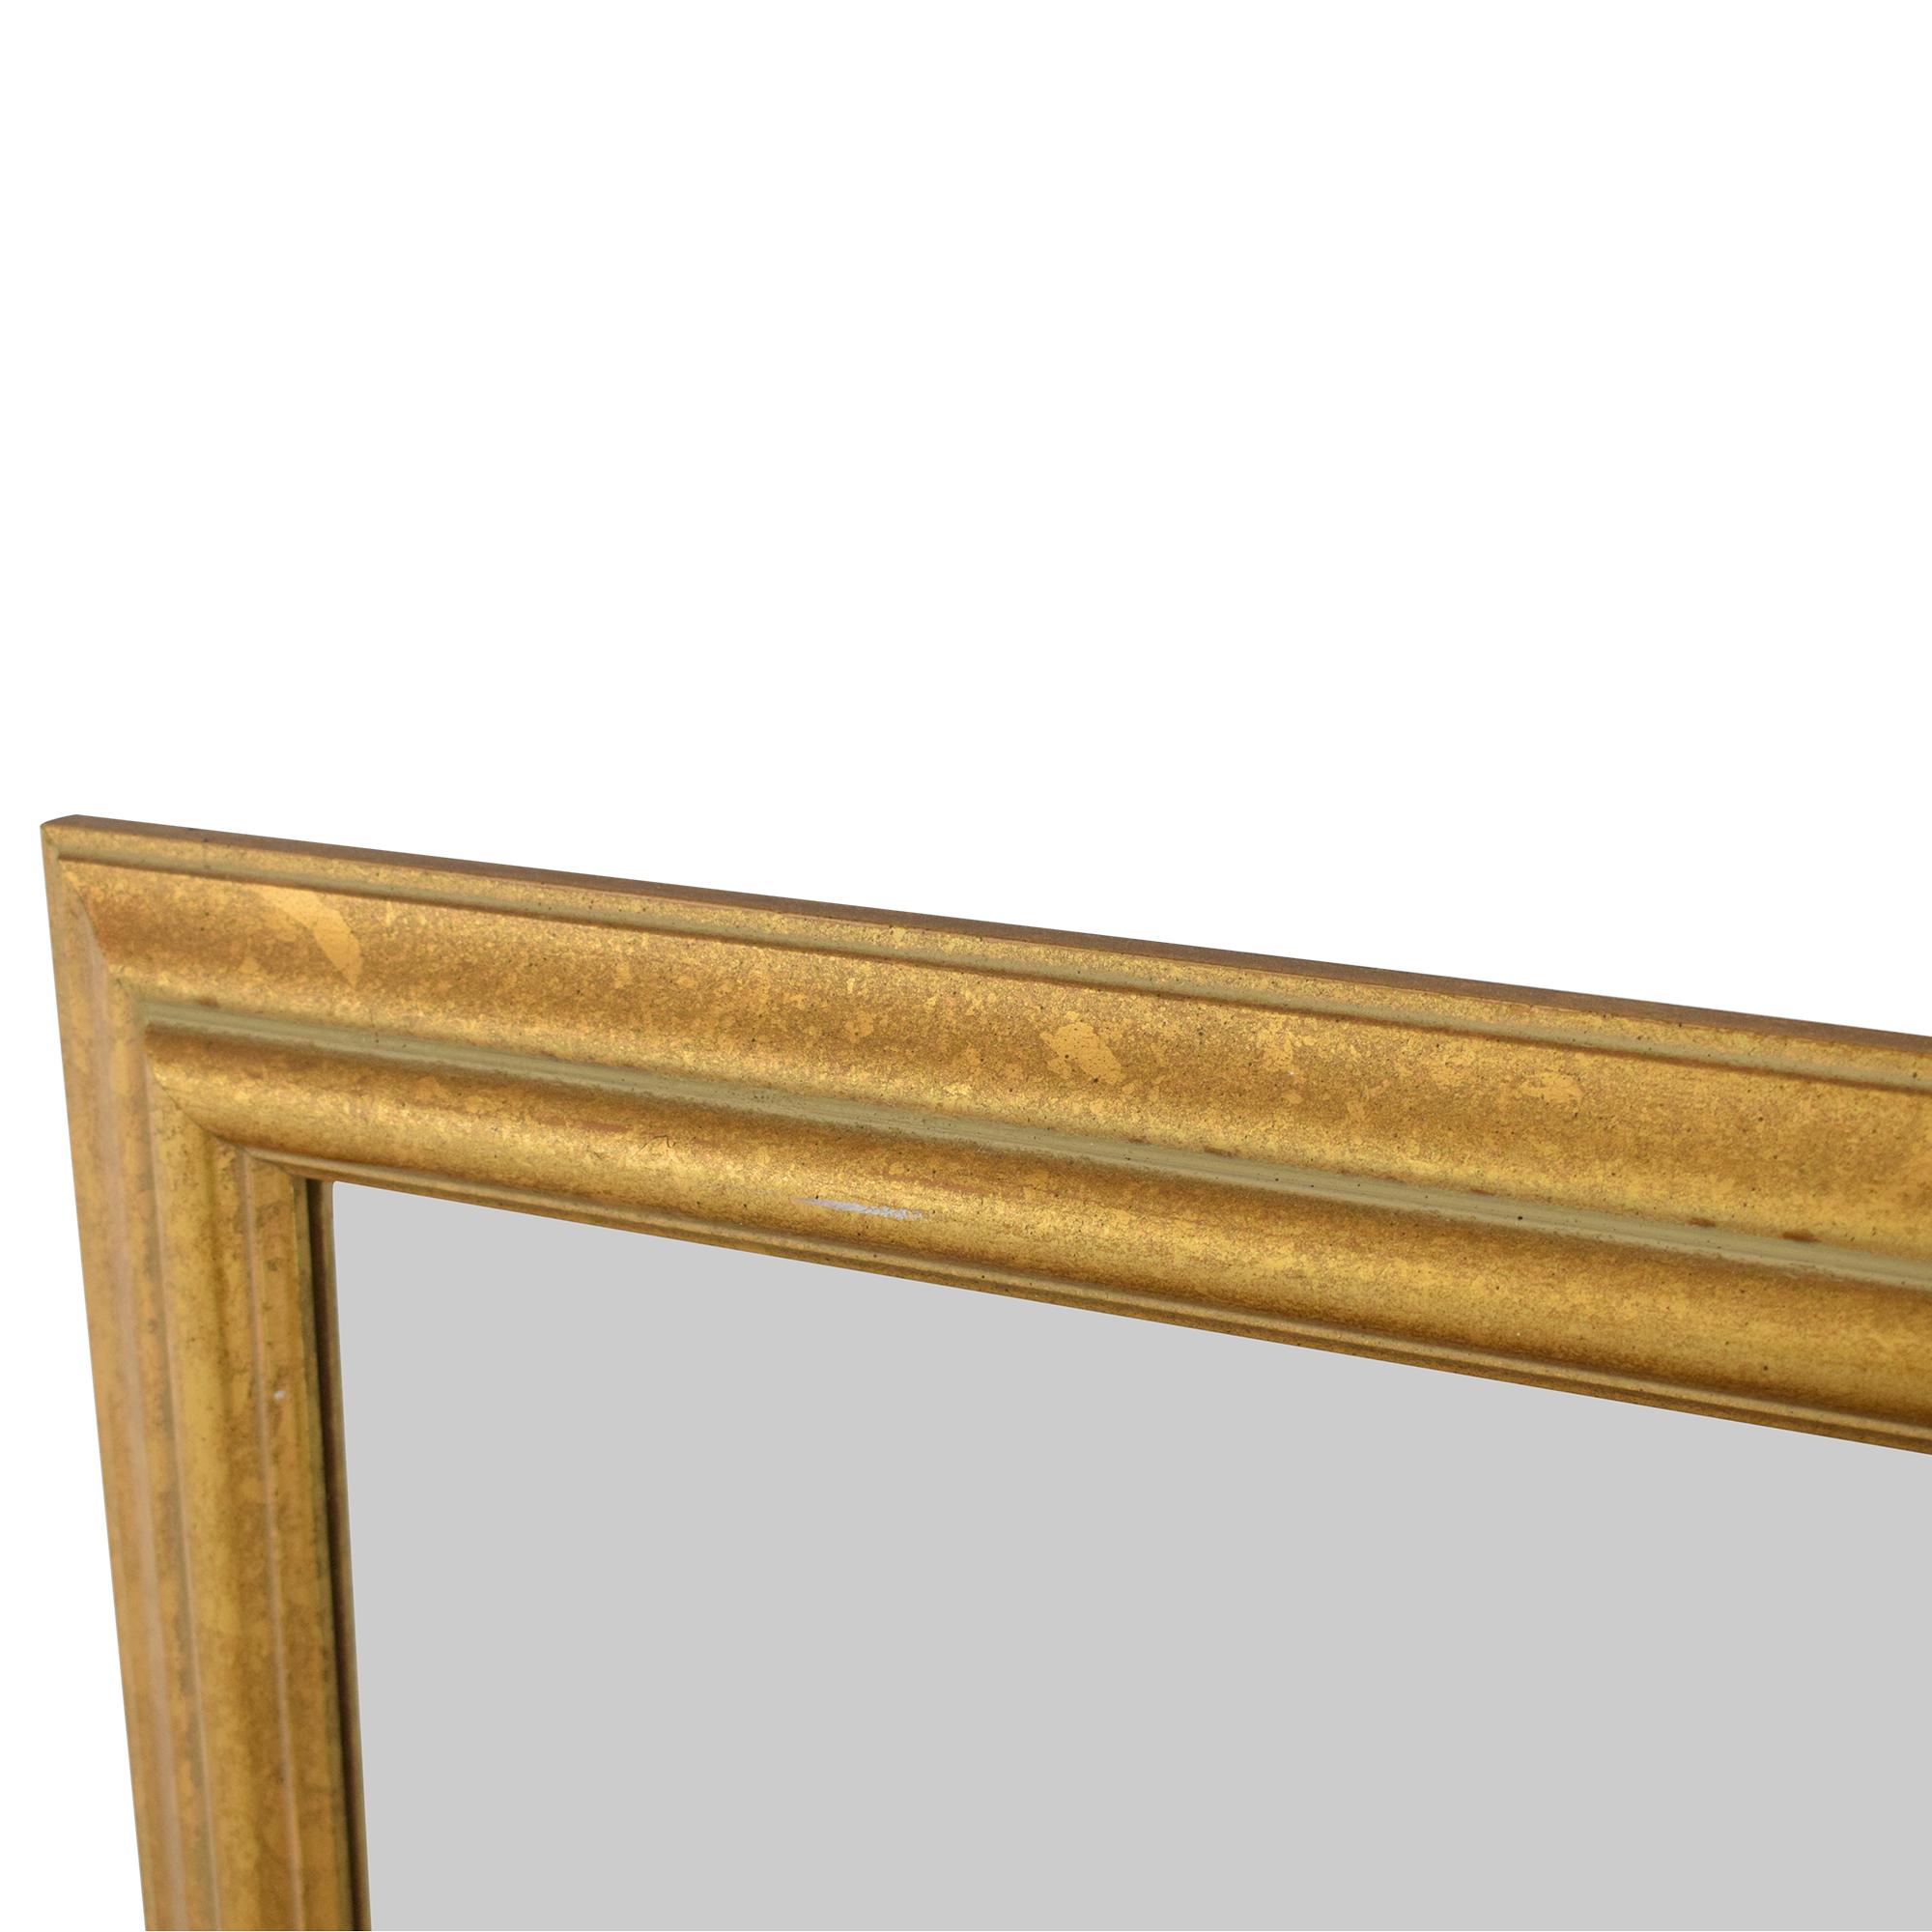 shop Uttermost Uttermost Framed Wall Mirror online